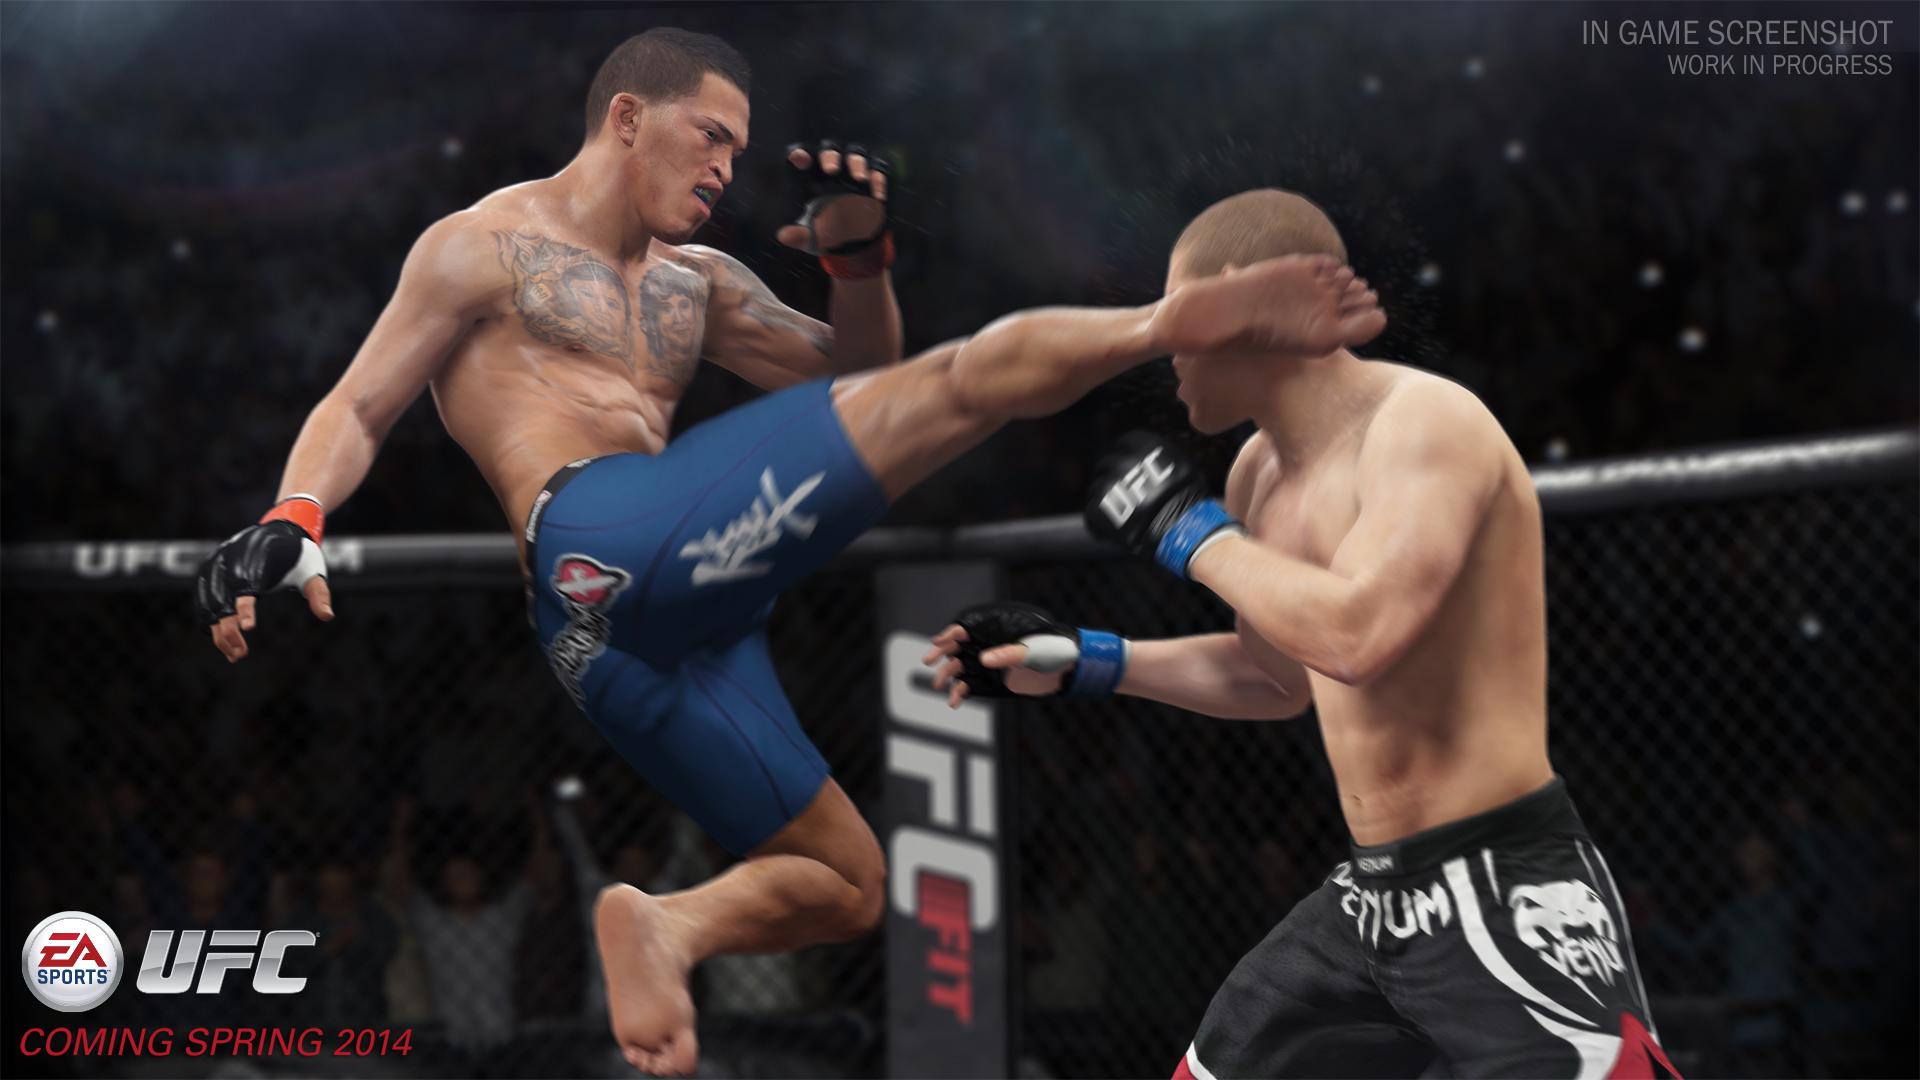 http://playsense.nl/wp-content/uploads/2014/02/EA-Sports-UFC-01.jpg